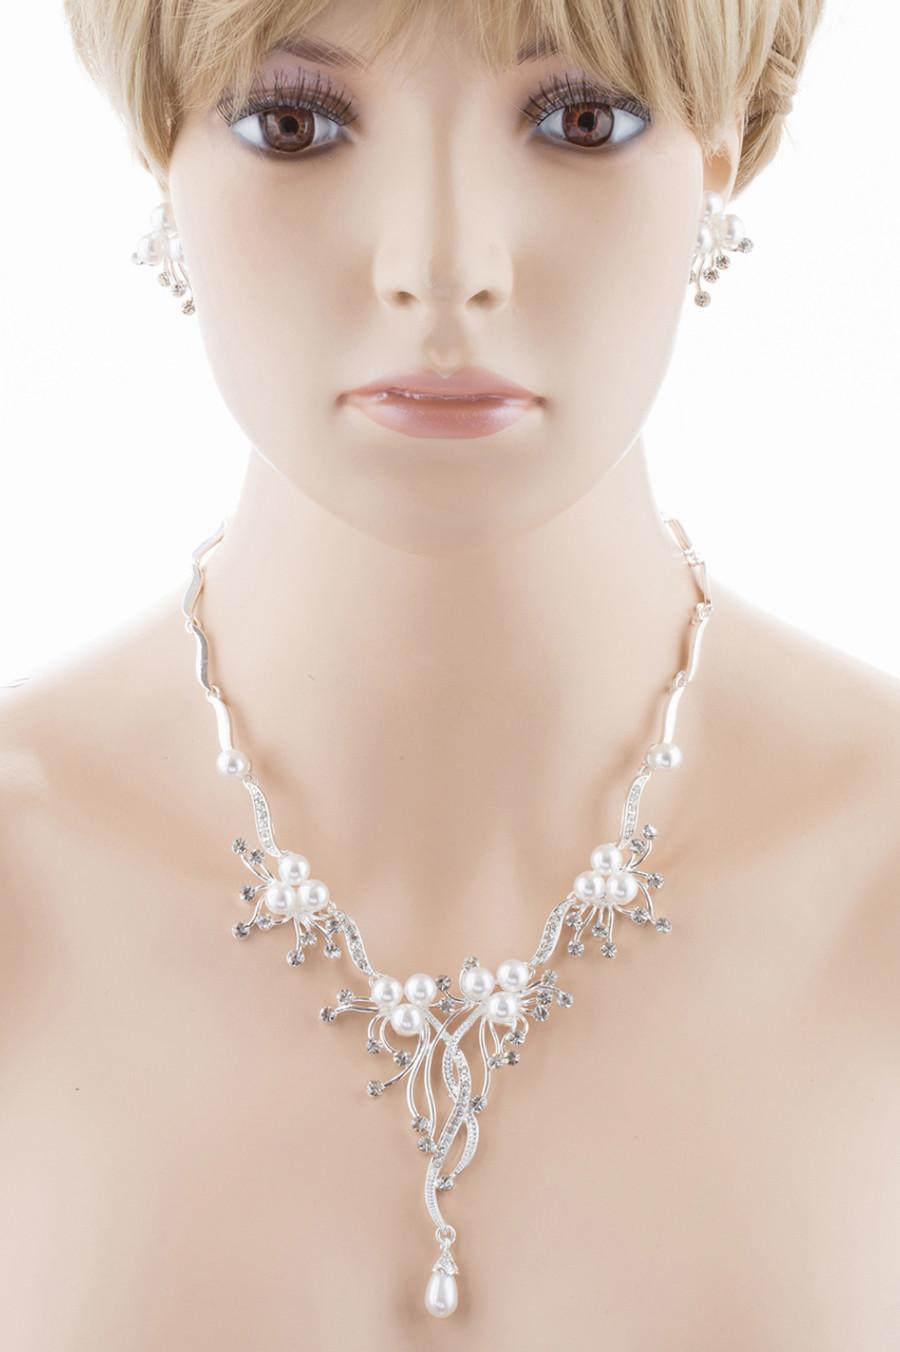 Bridal Wedding Jewelry Set Crystal Rhinestone Pearl Floral Vine Design Necklace